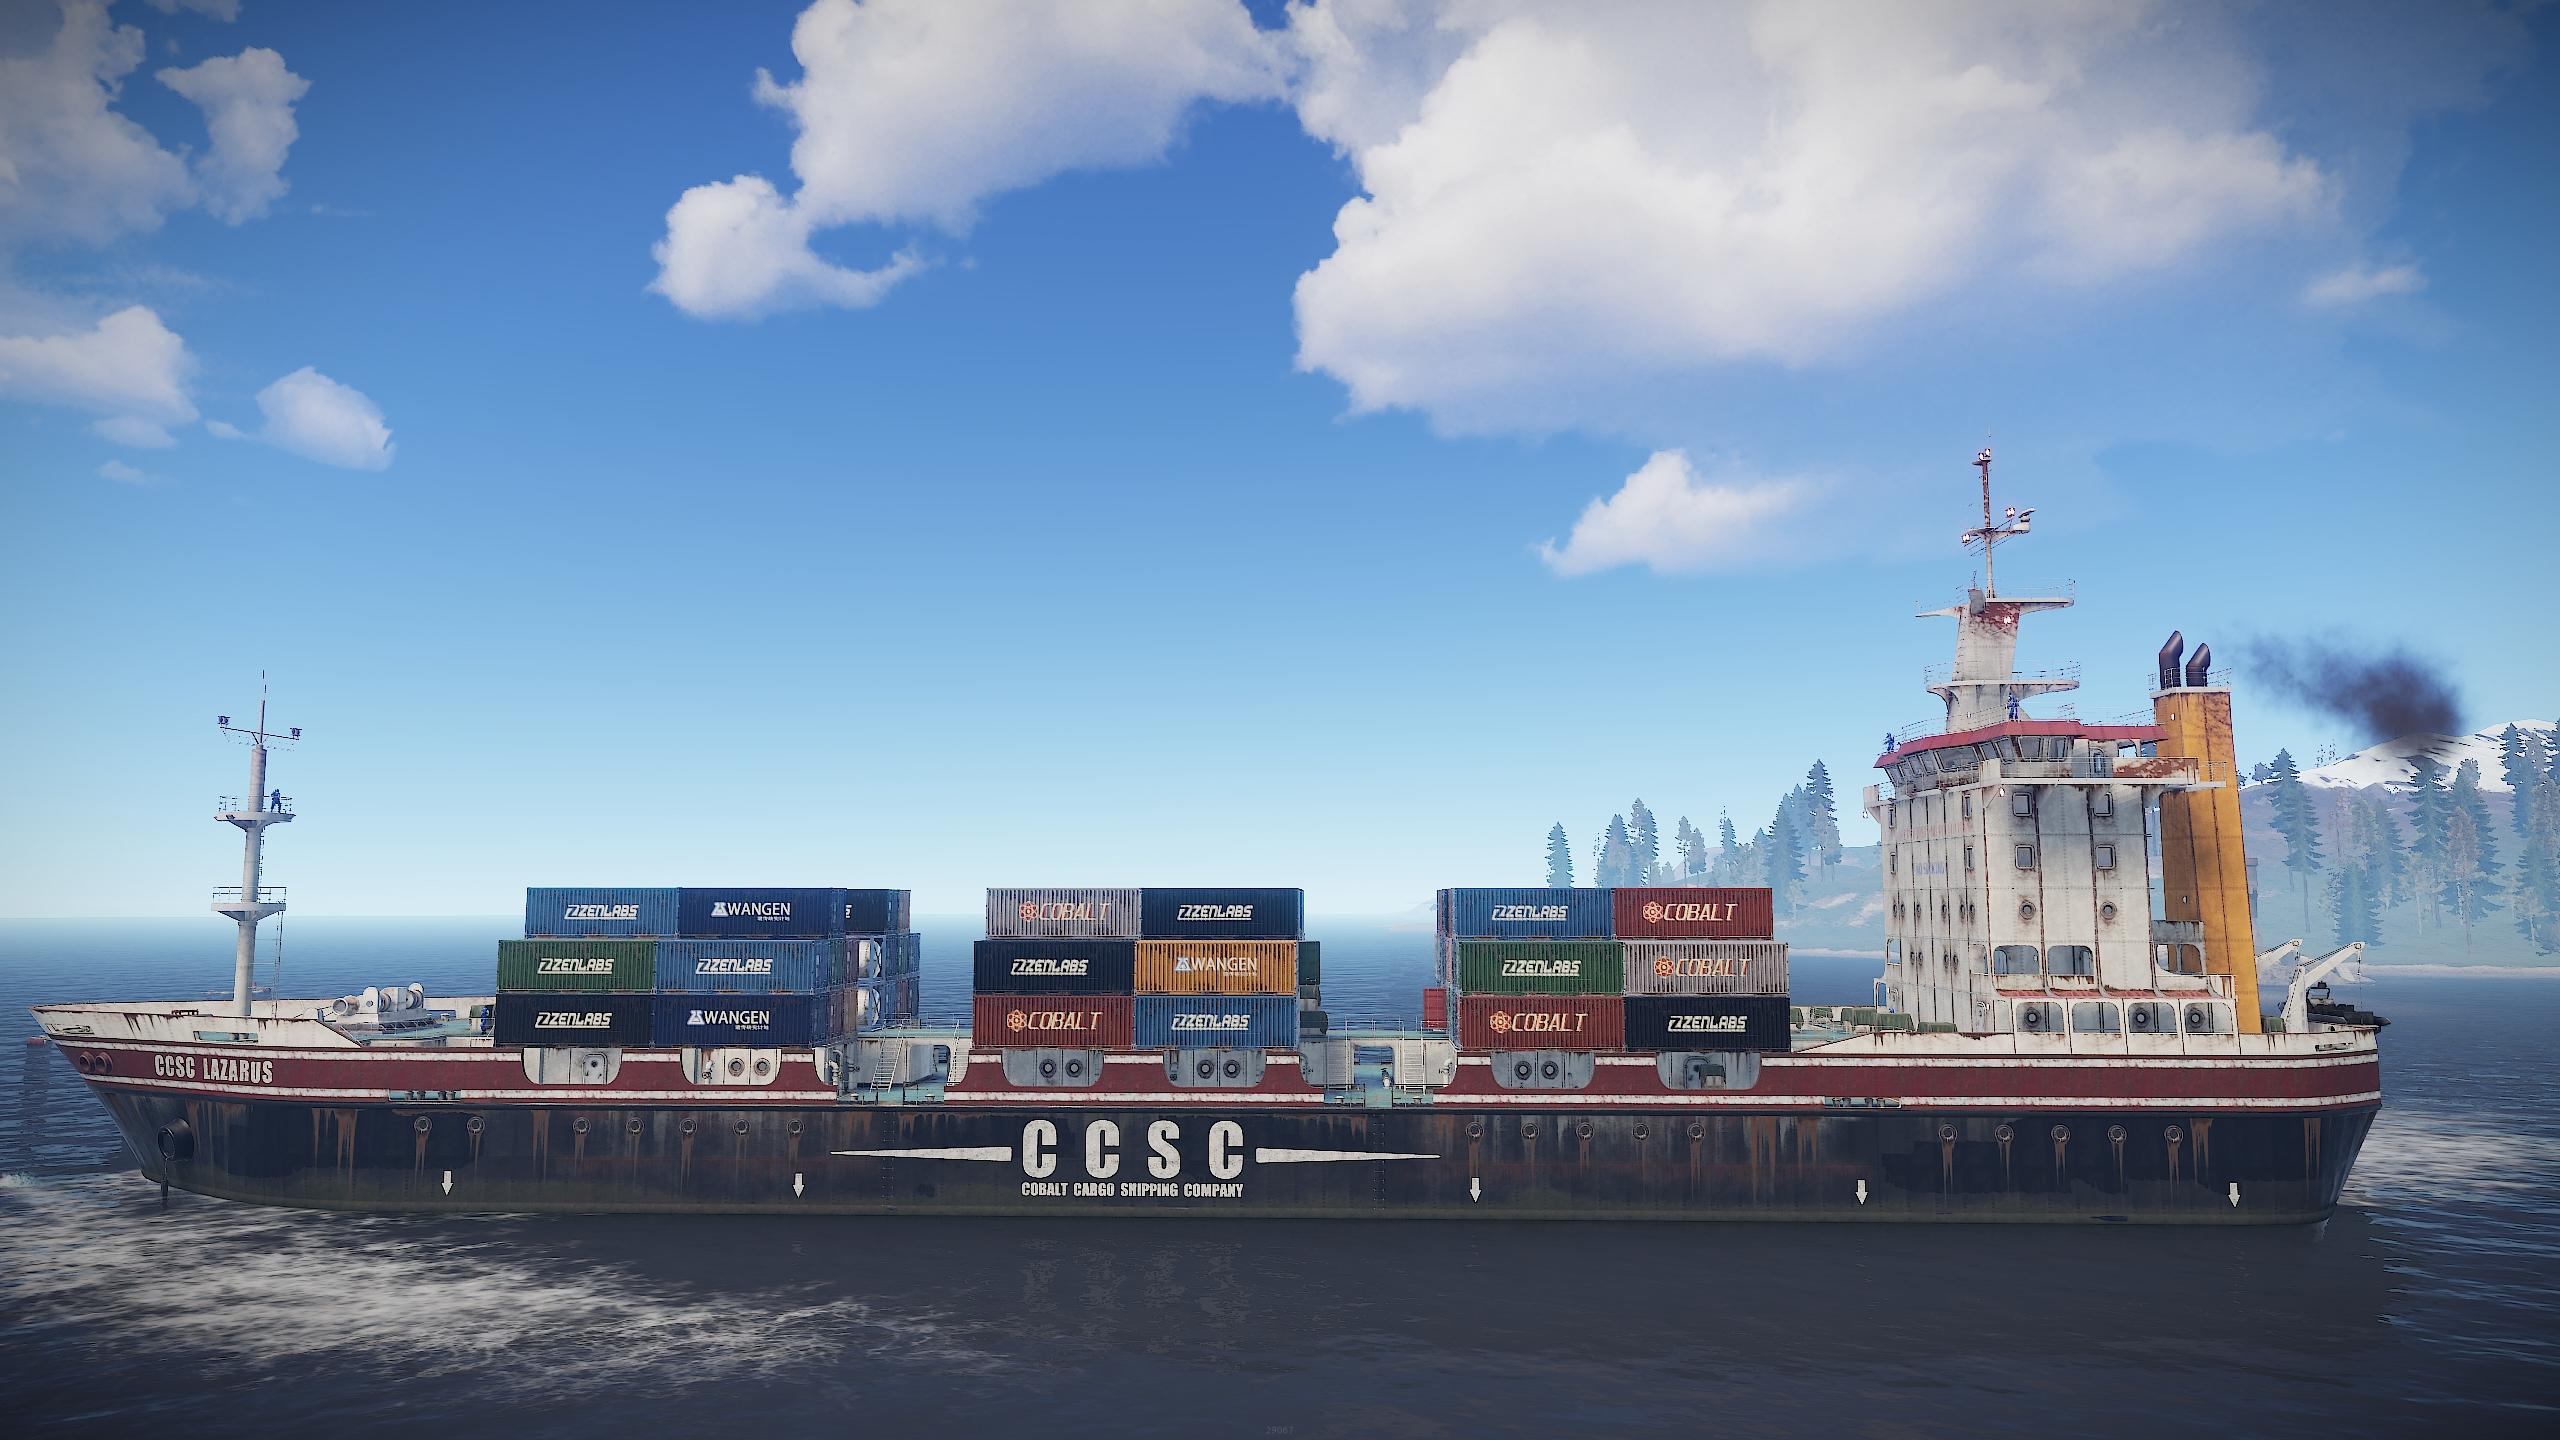 The_Cargo_Ship_Update_1.jpg